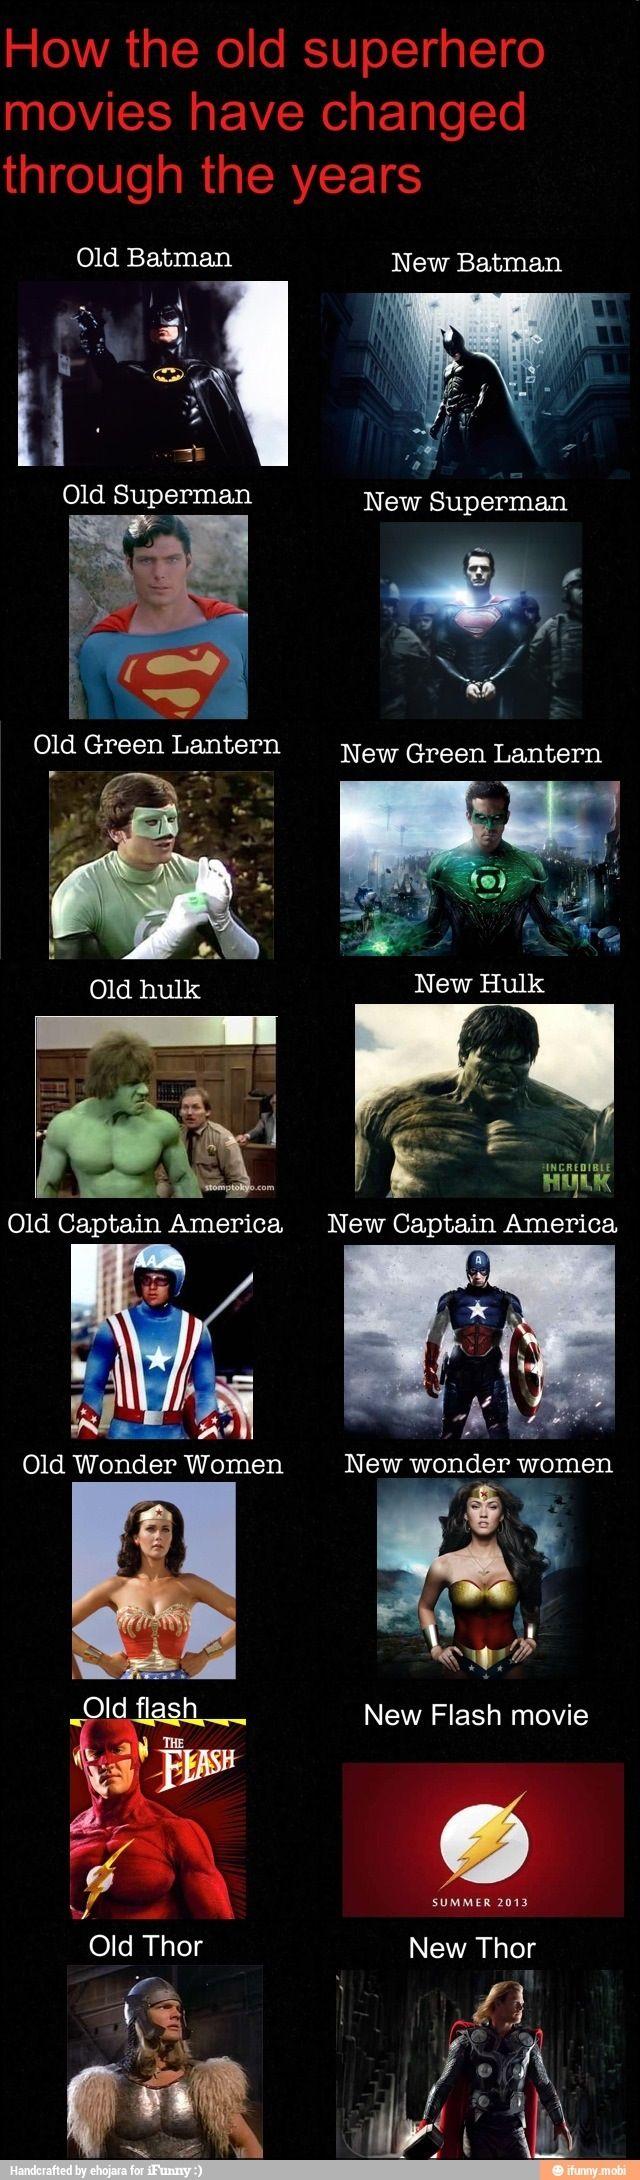 115 best images about super heroes and villains on - Super batman movie ...